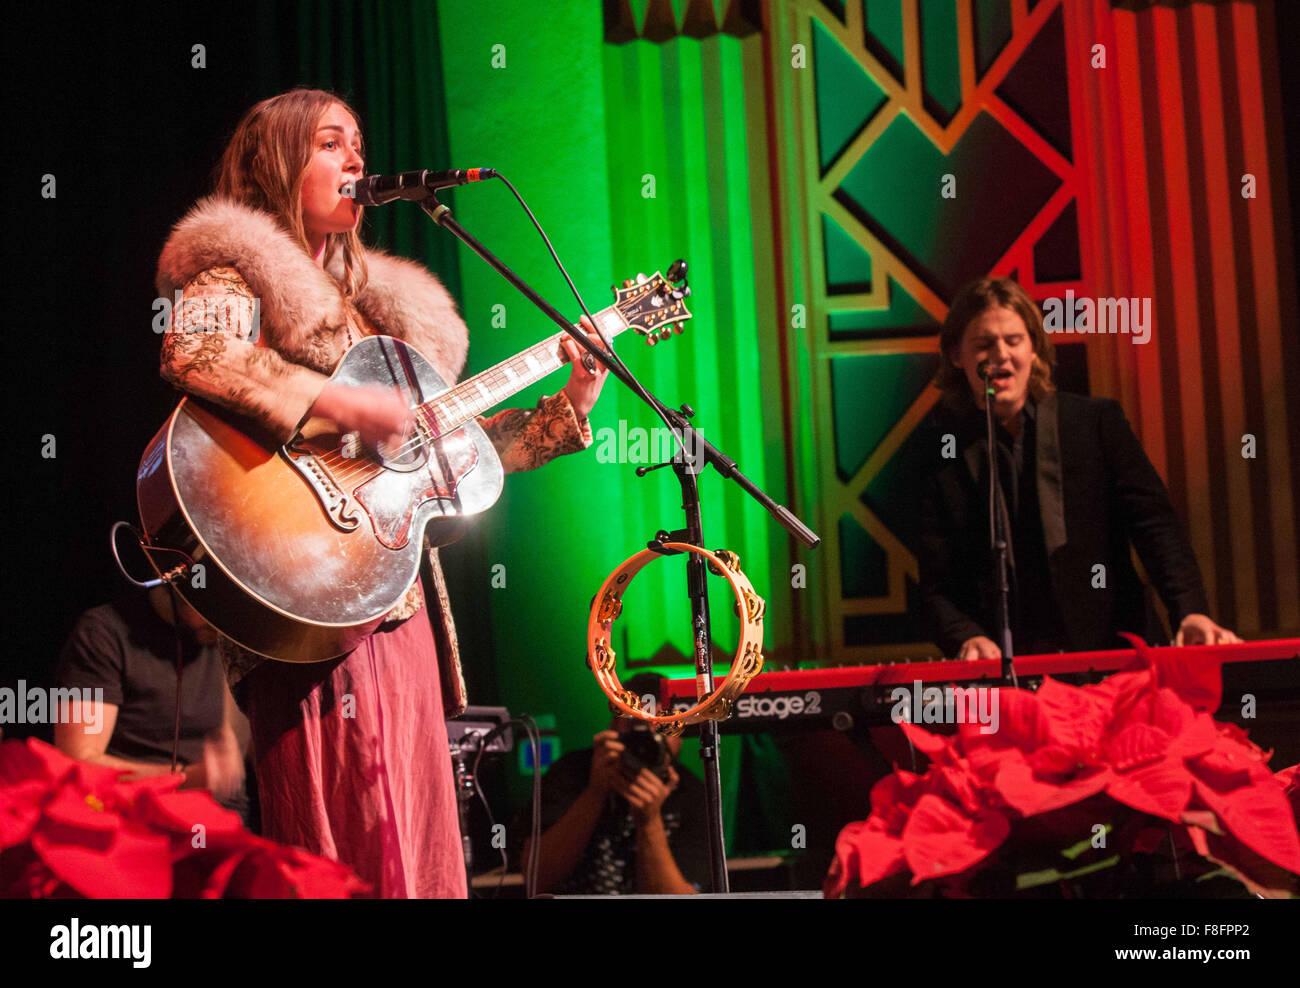 Iheart Christmas.Modesto Ca Usa 8th Dec 2015 Iheart Radio B93 Acoustic